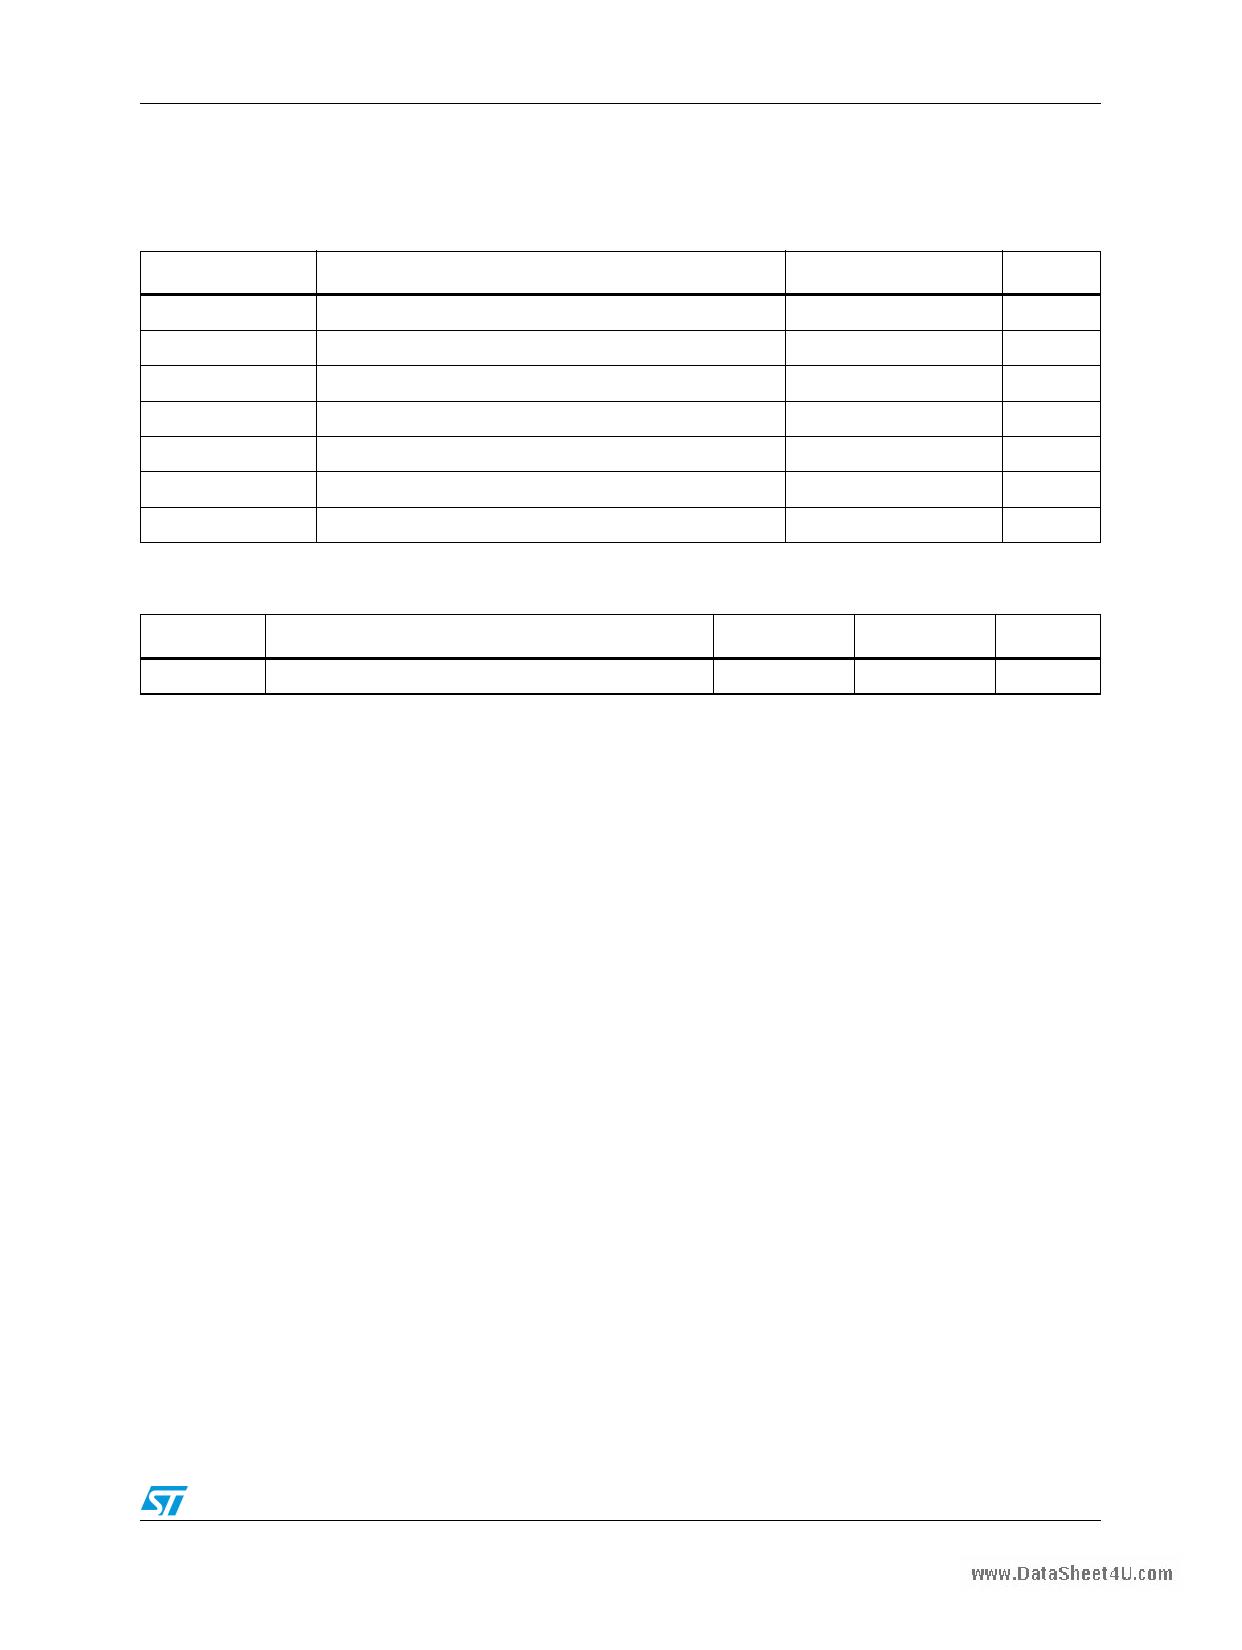 E-ULN2001A pdf